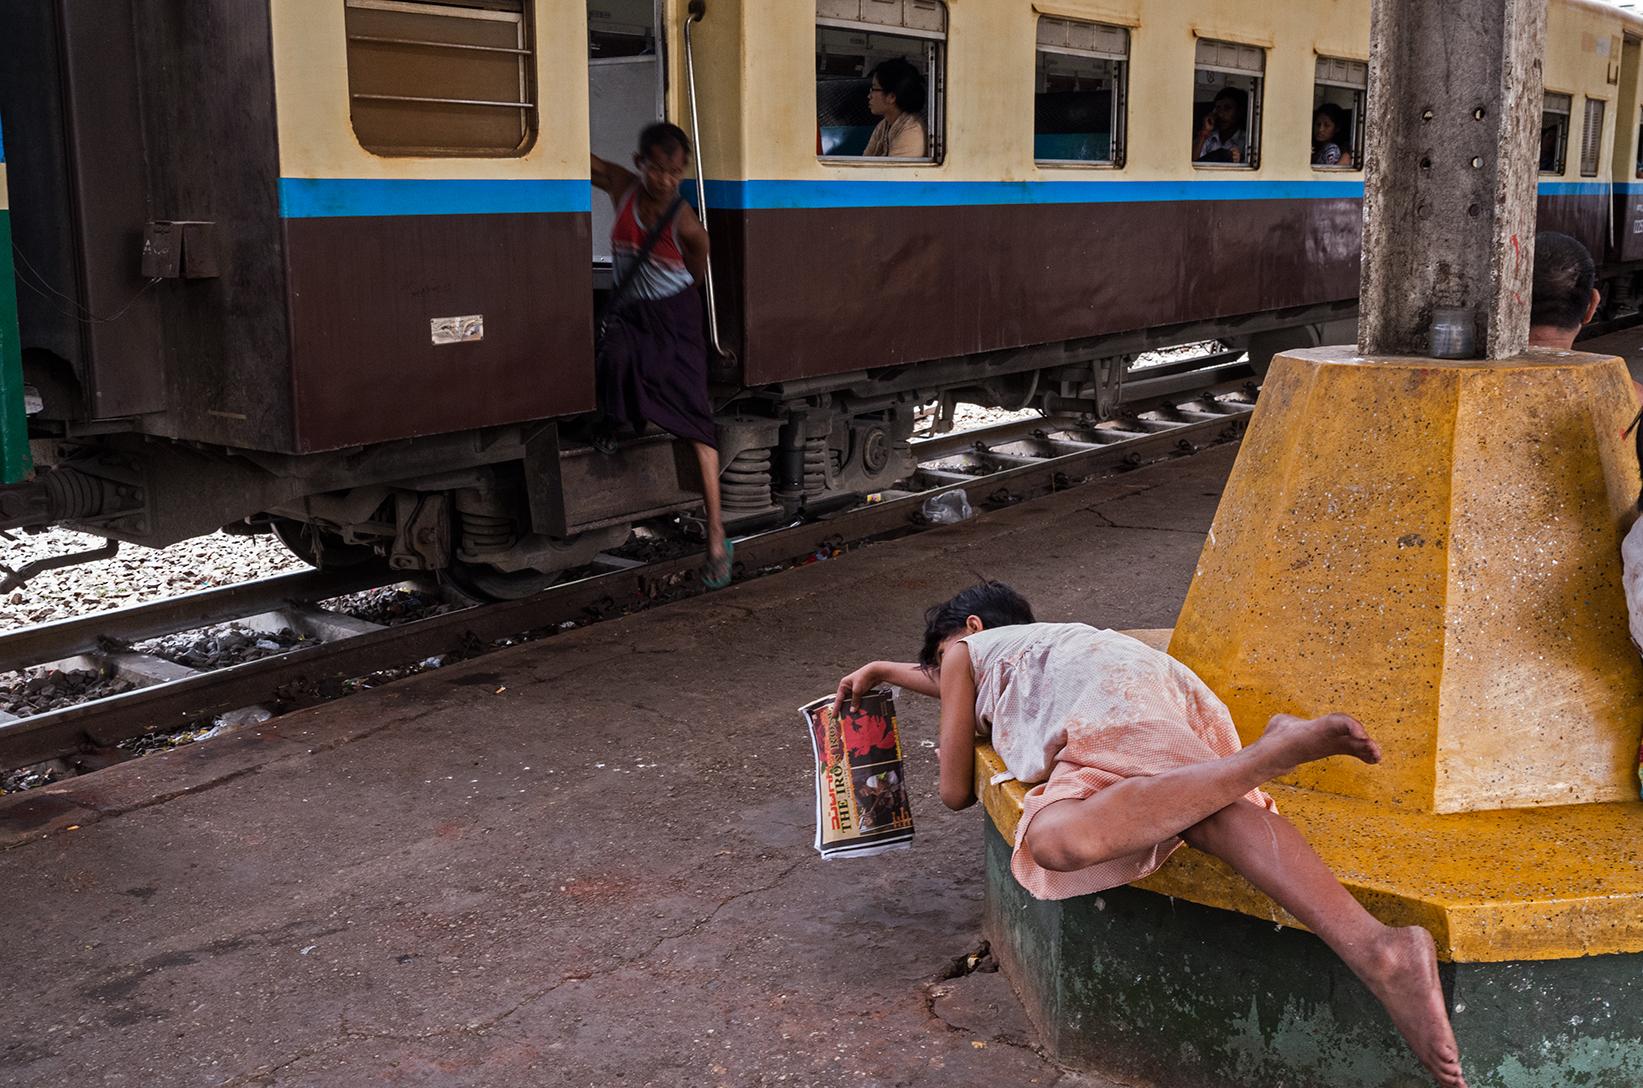 train-station01_s.jpg